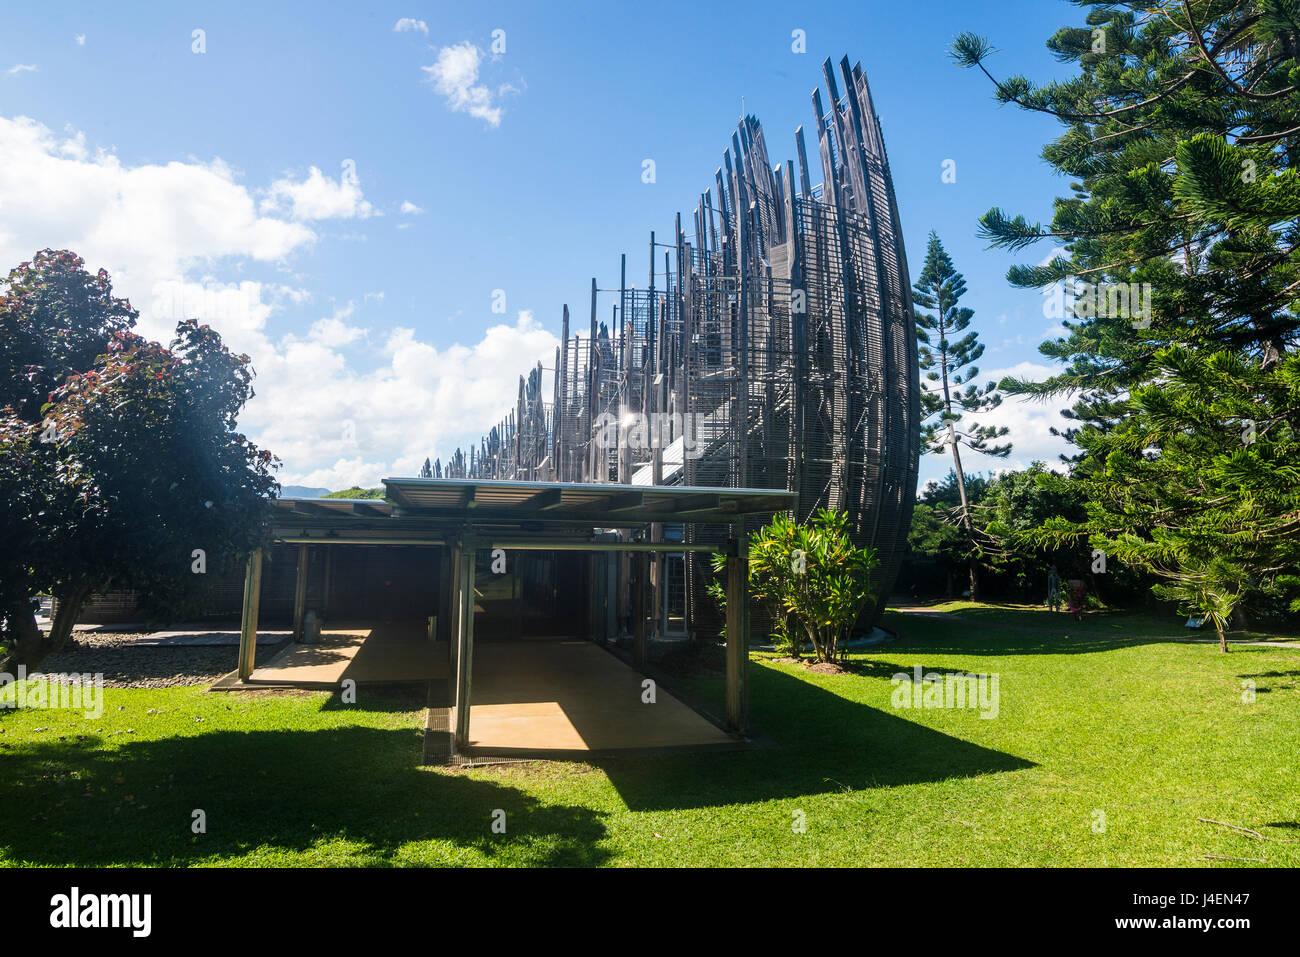 Jean-Marie Tjibaou Cultural Centre, Noumea, New Caledonia, Pacific - Stock Image